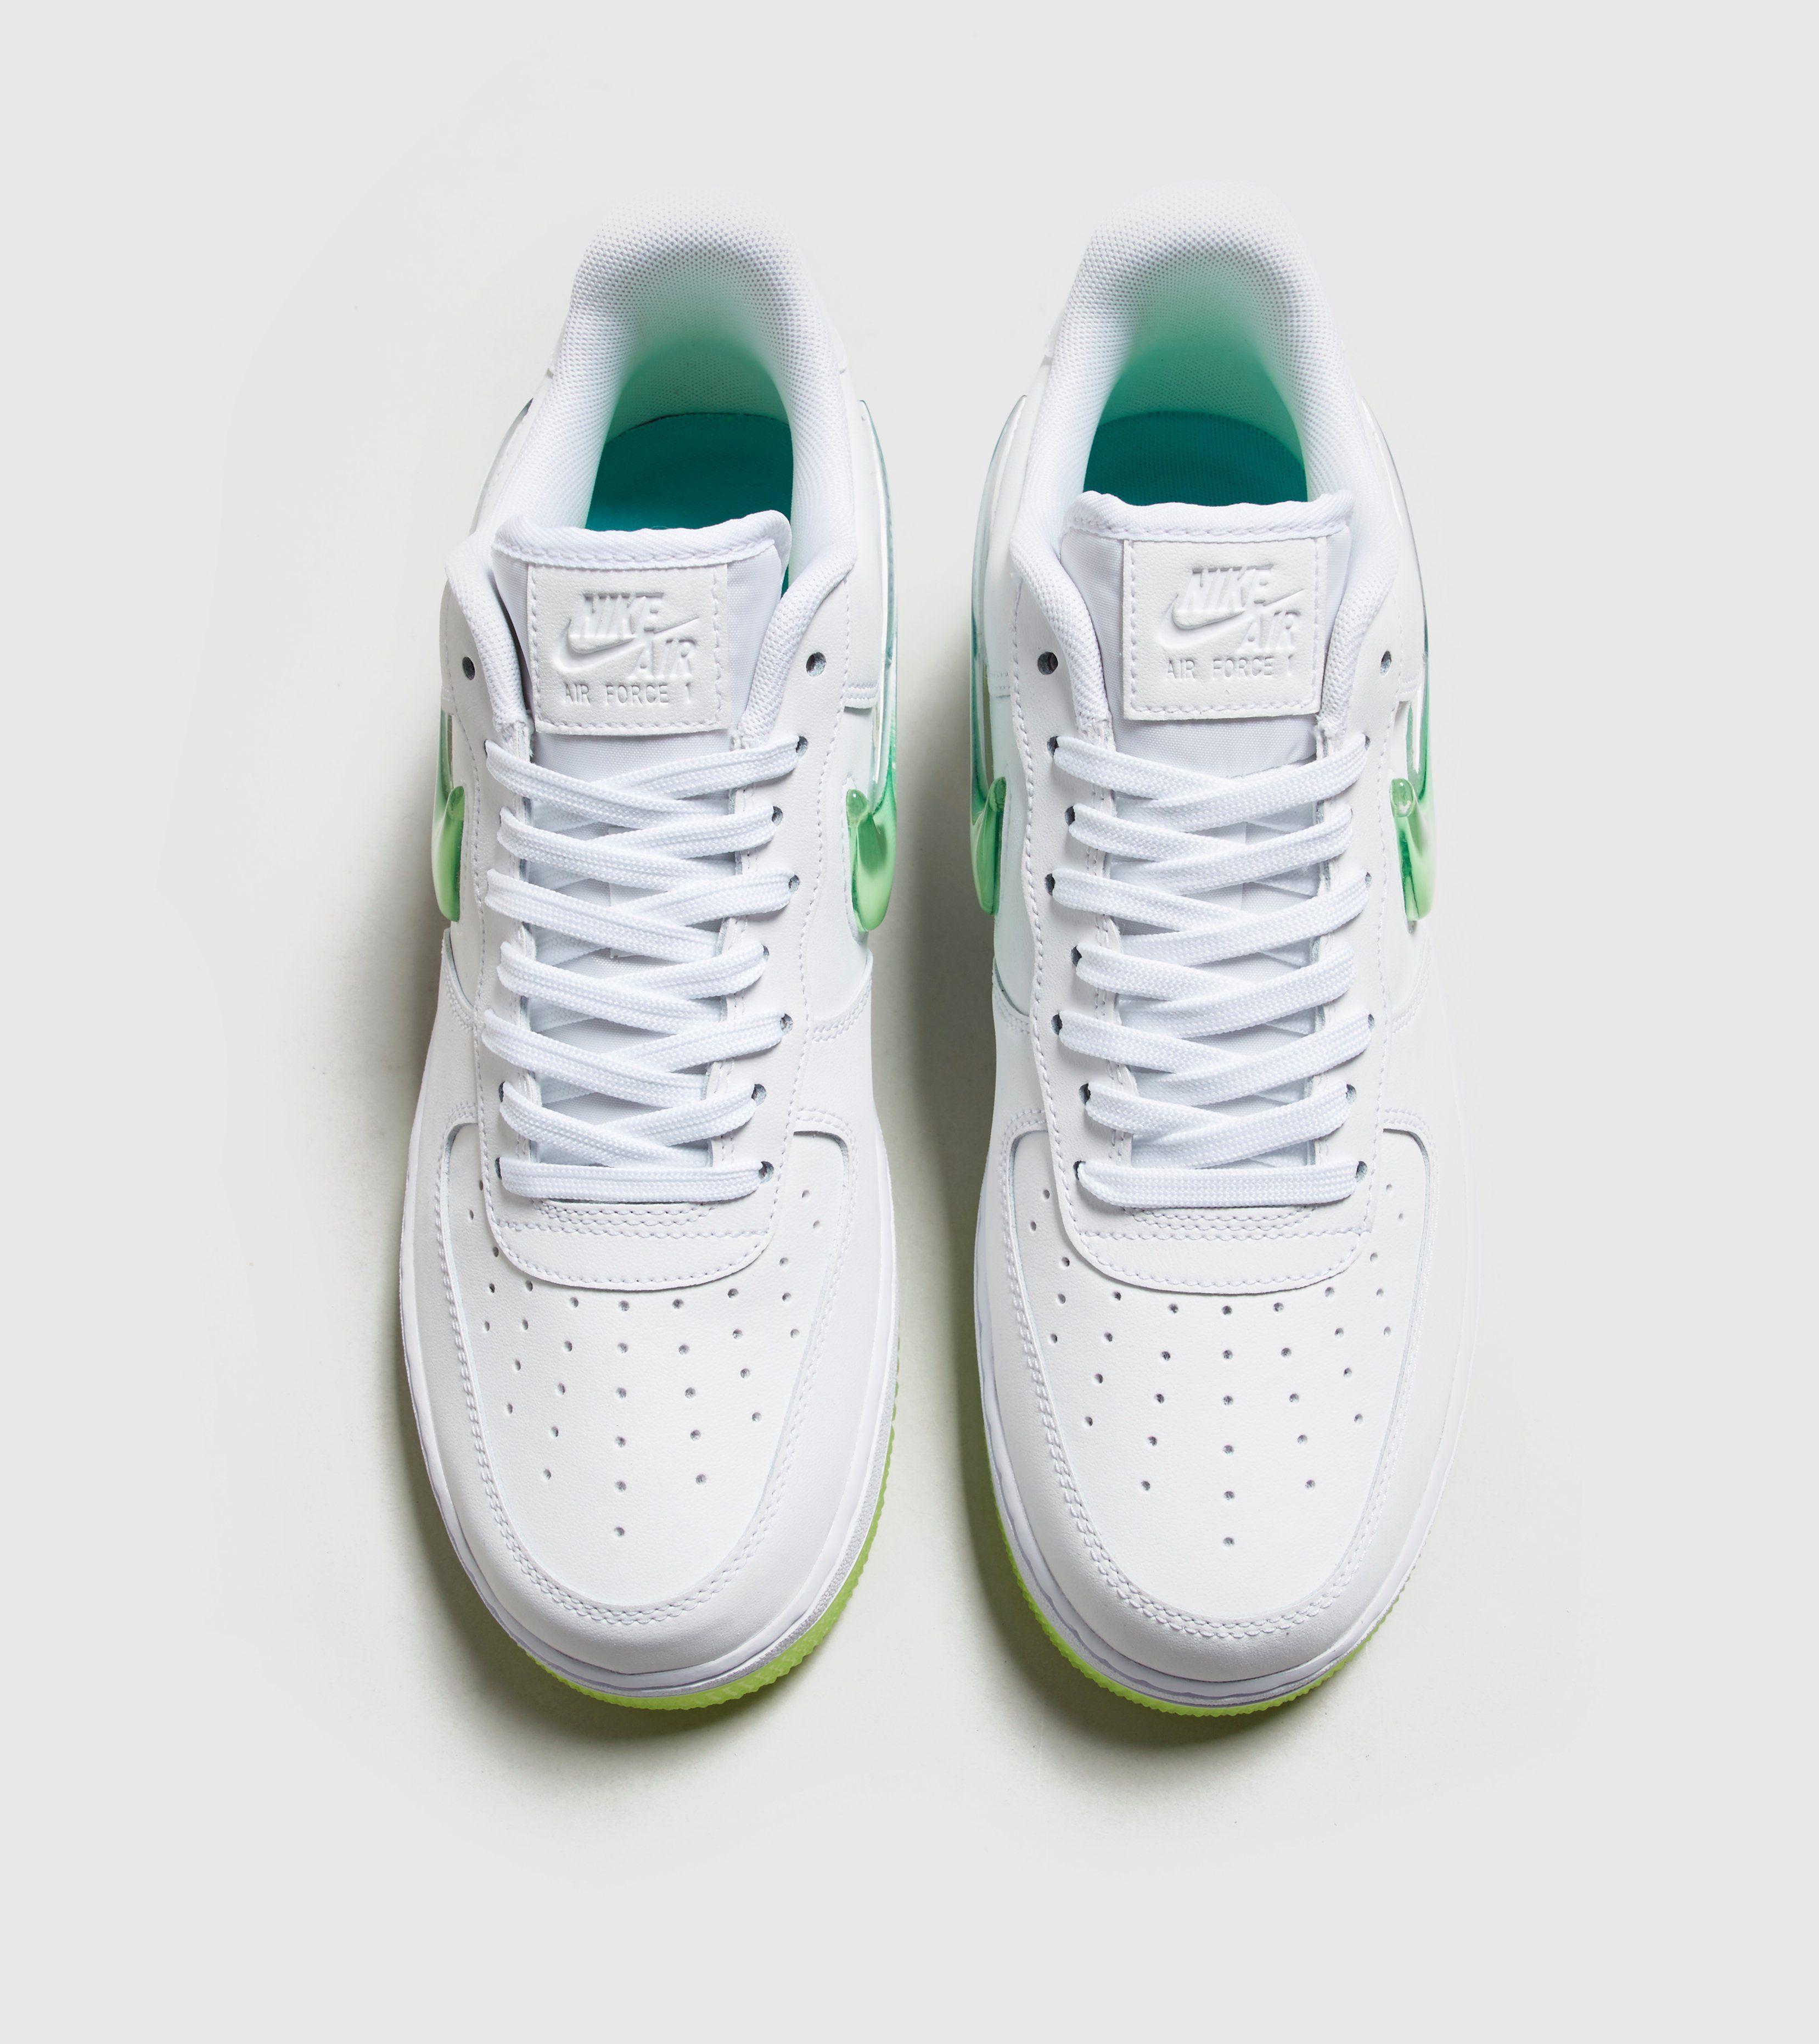 Nike Air Force 1 Premium 'Jelly' Women's